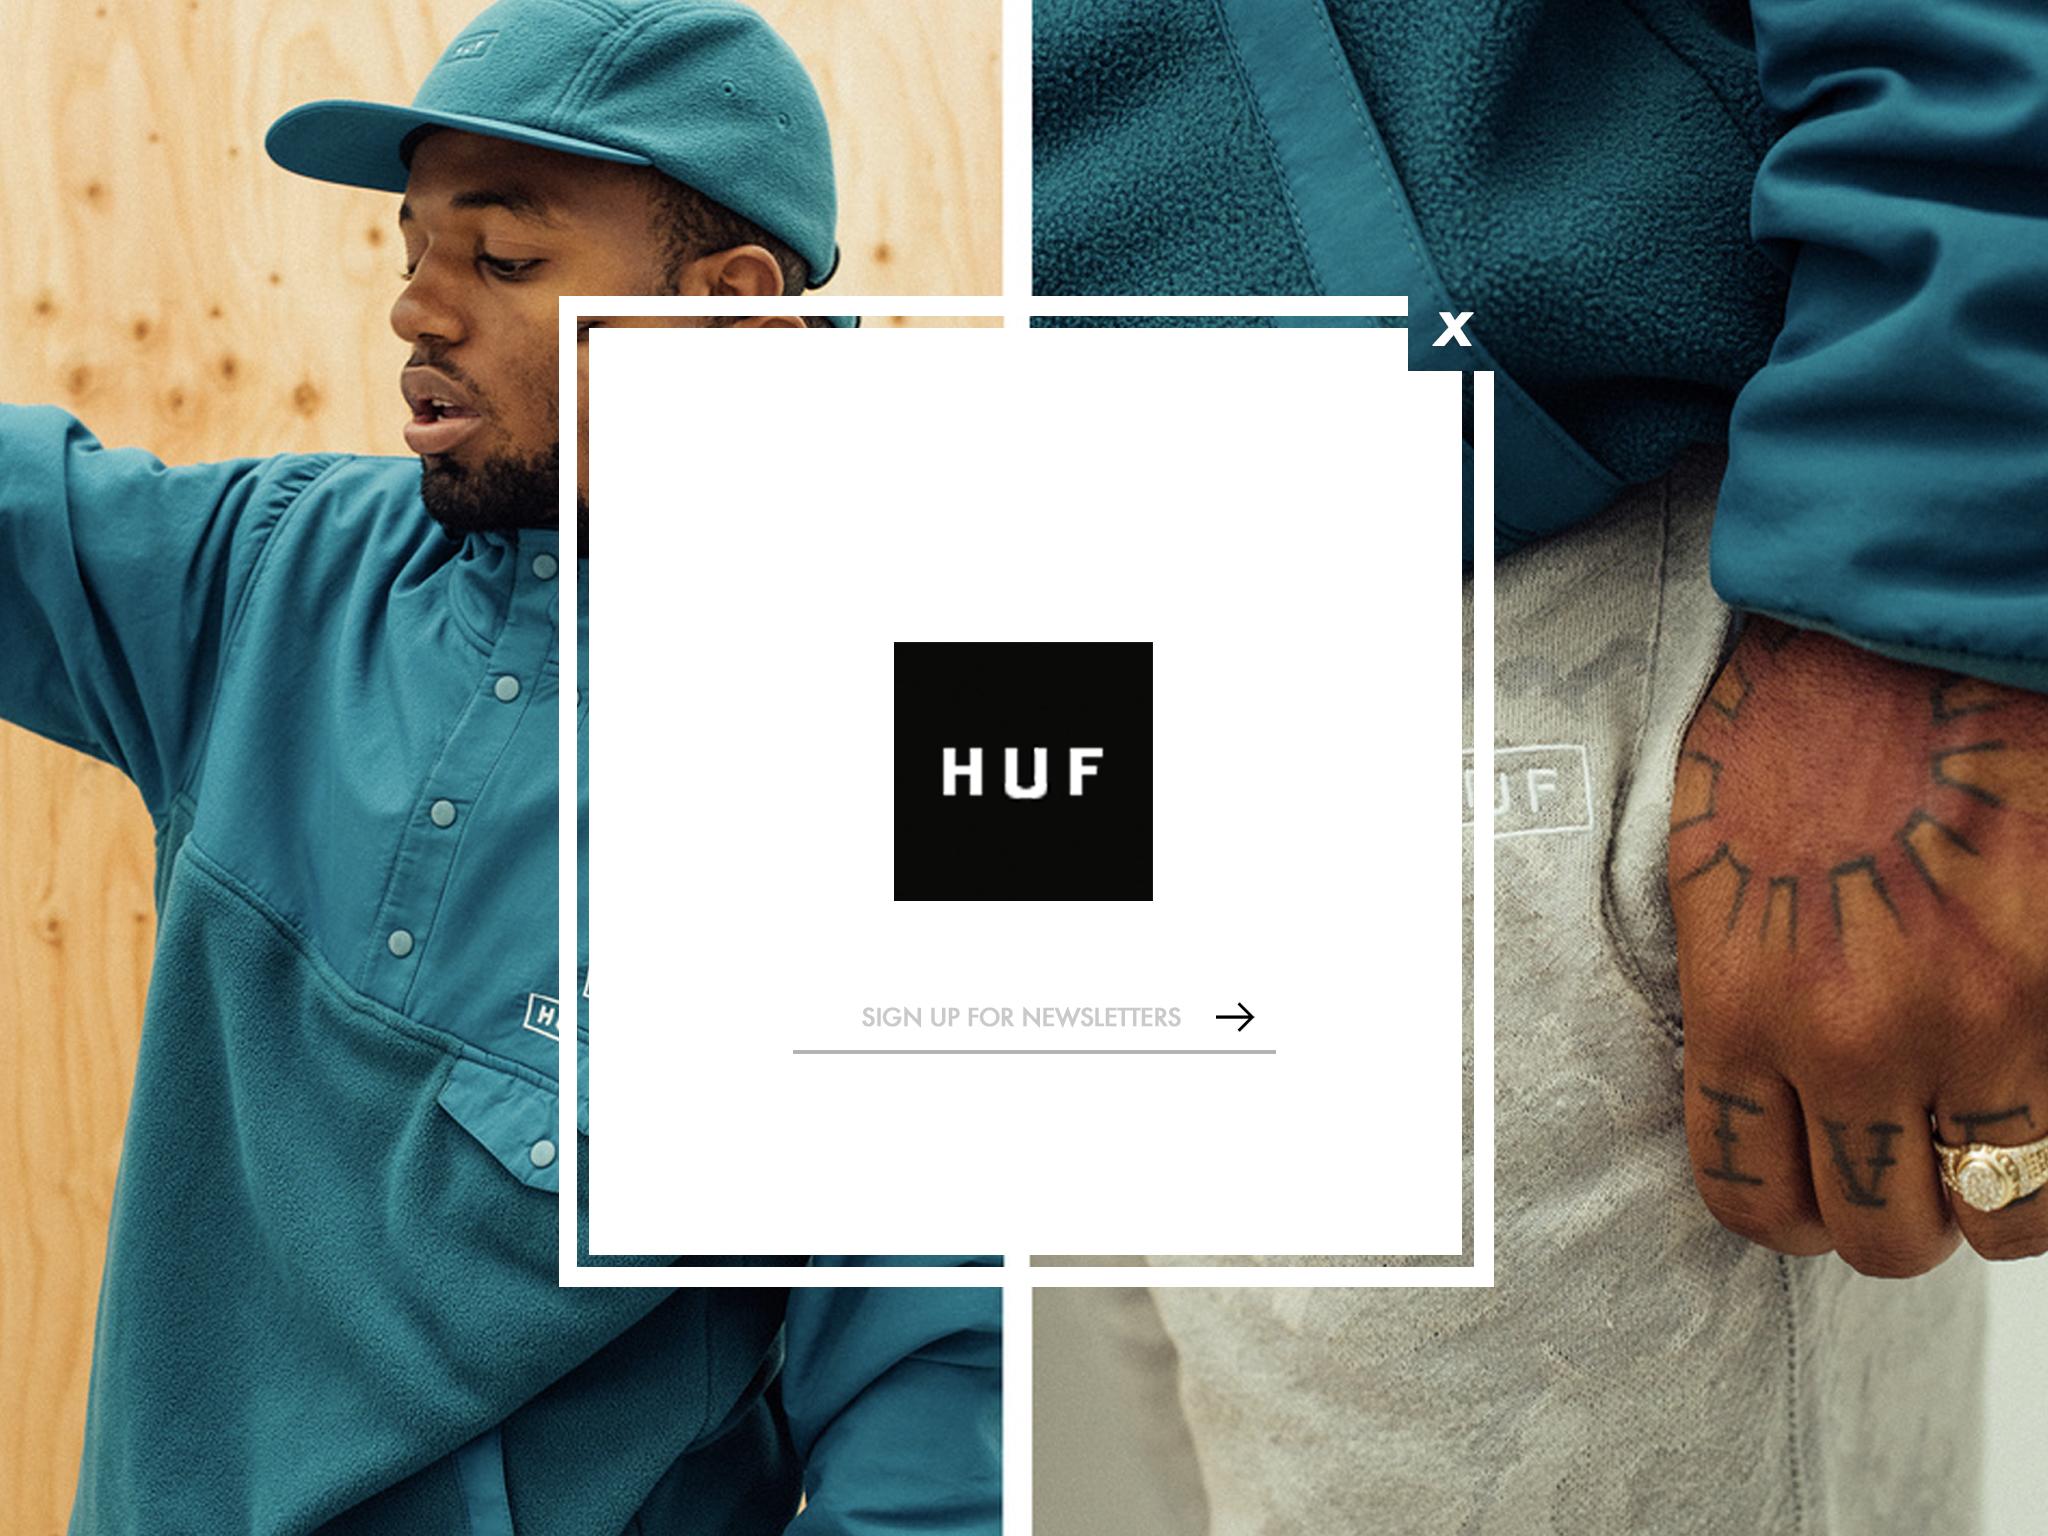 HUF Pop Up/Overlay Box